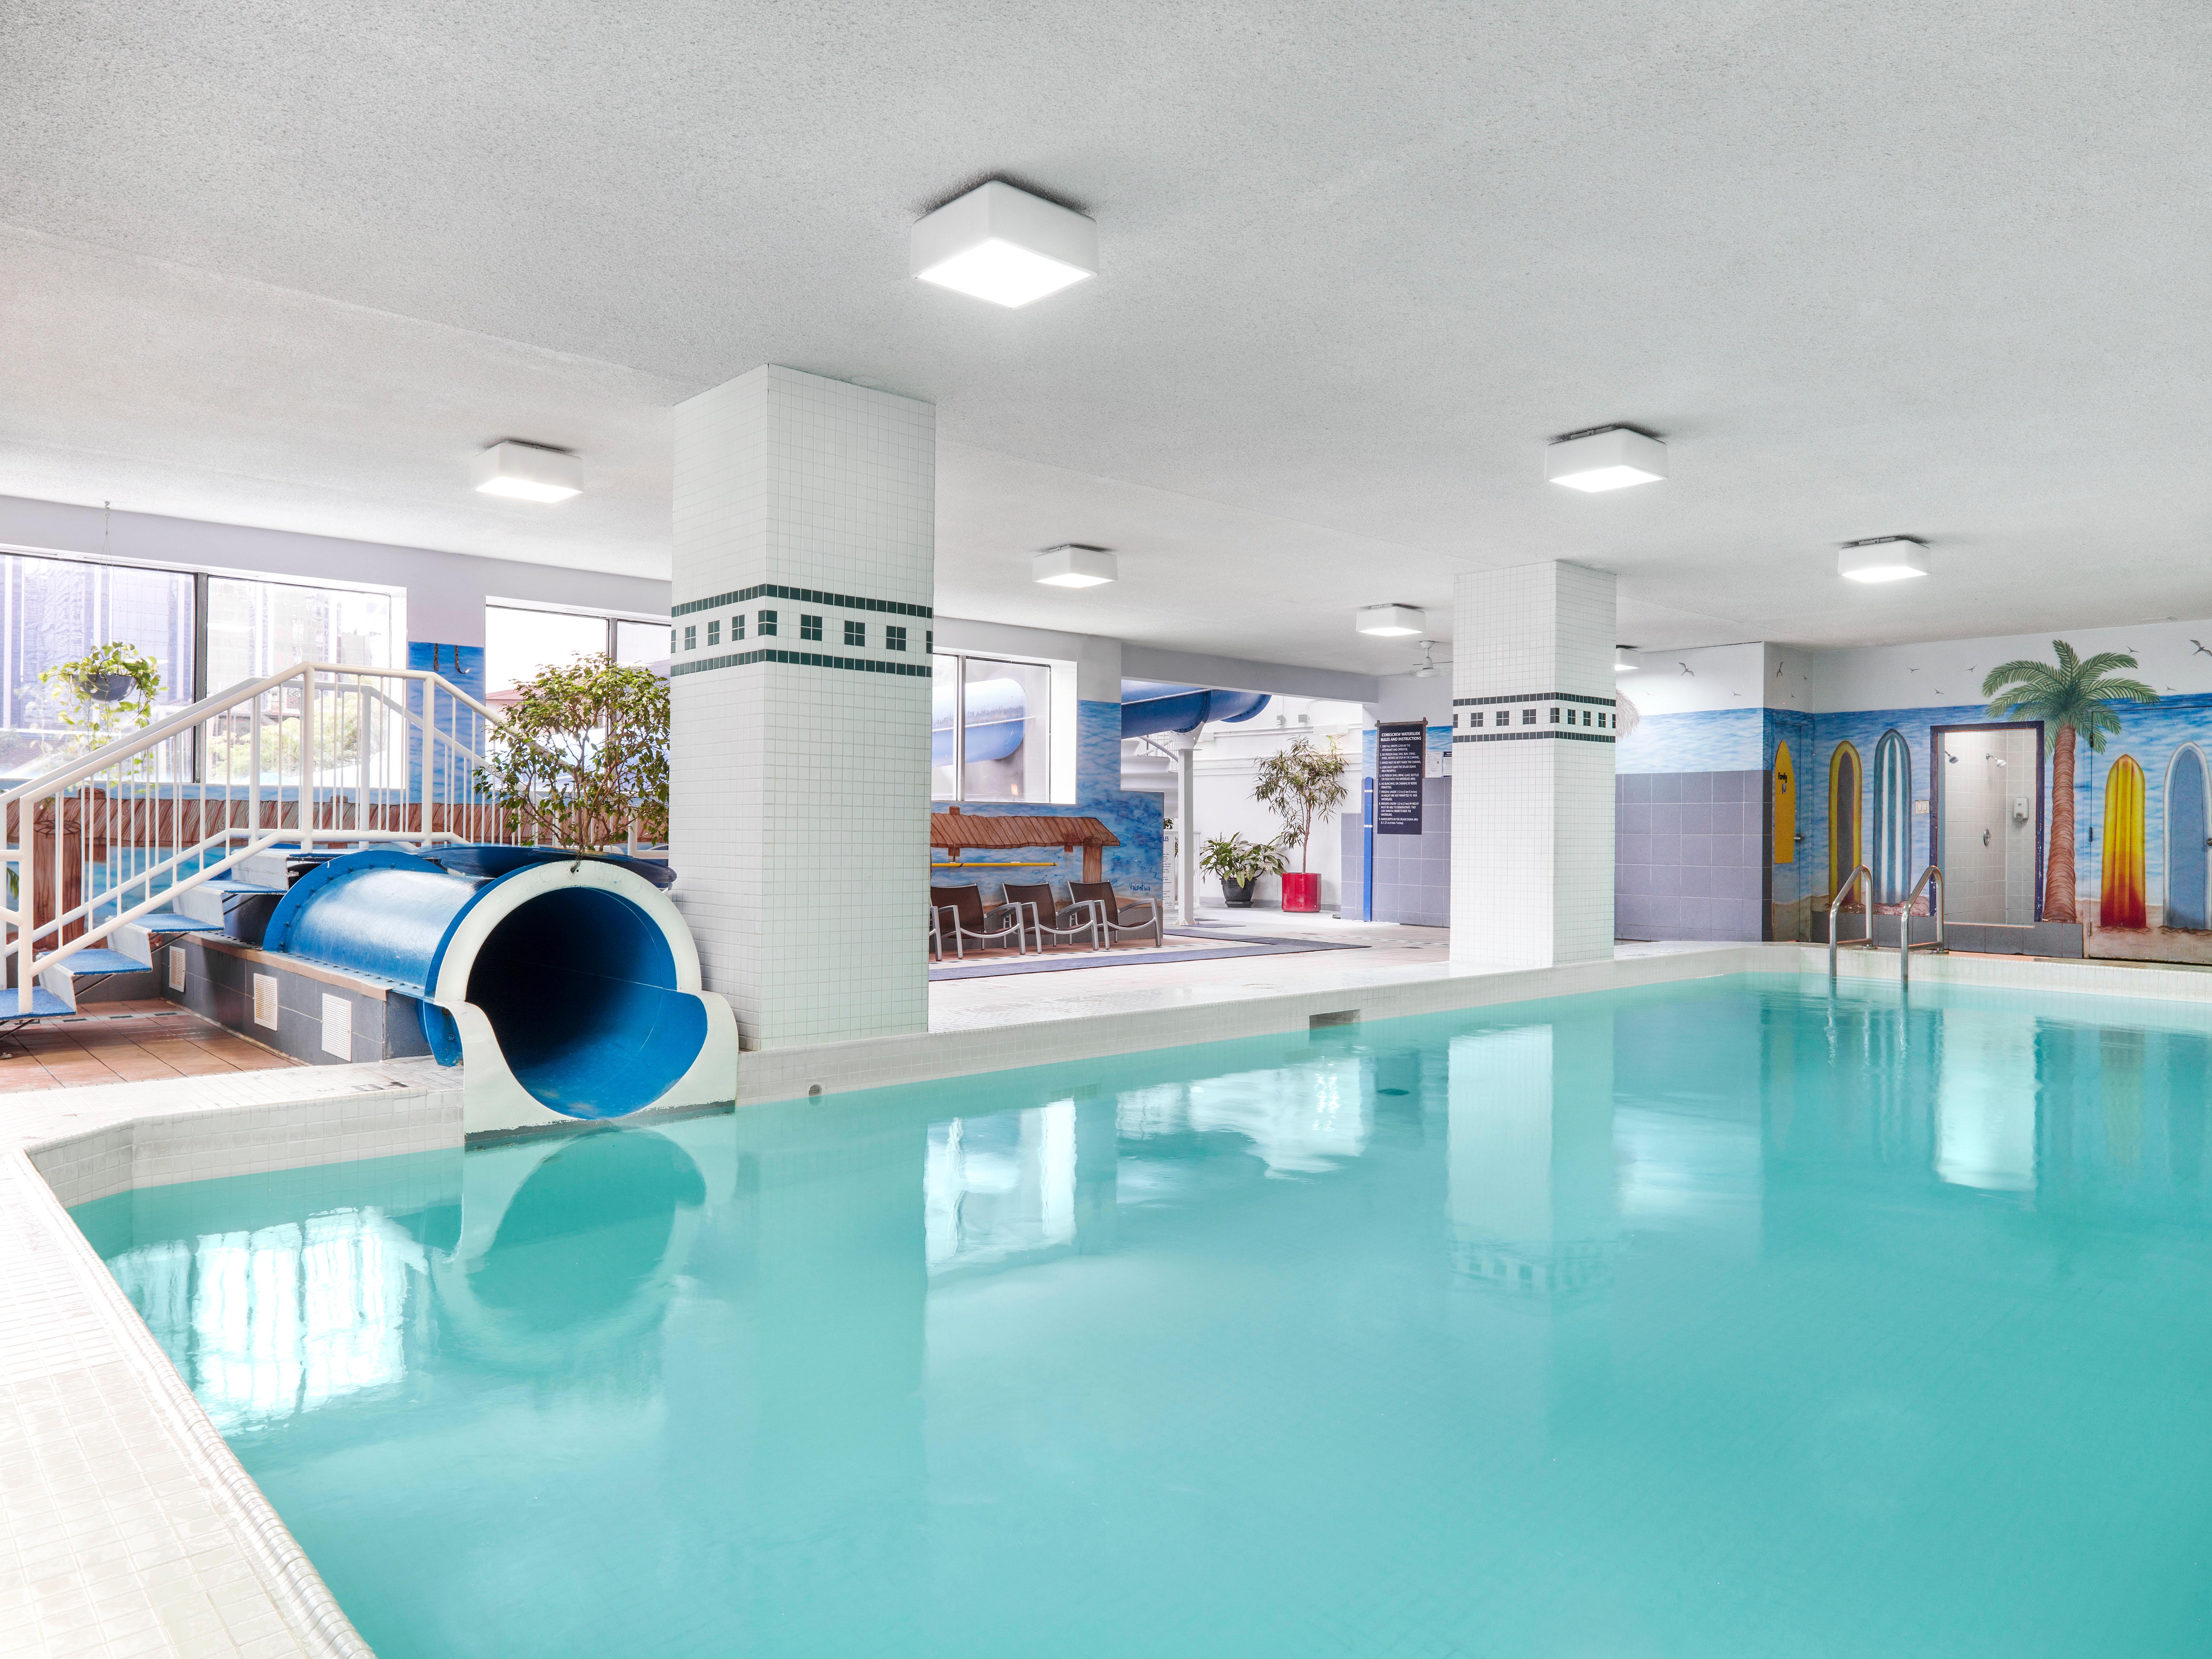 CHELSEA HOTEL, TORONTO in Toronto: Kids Swimming Pool